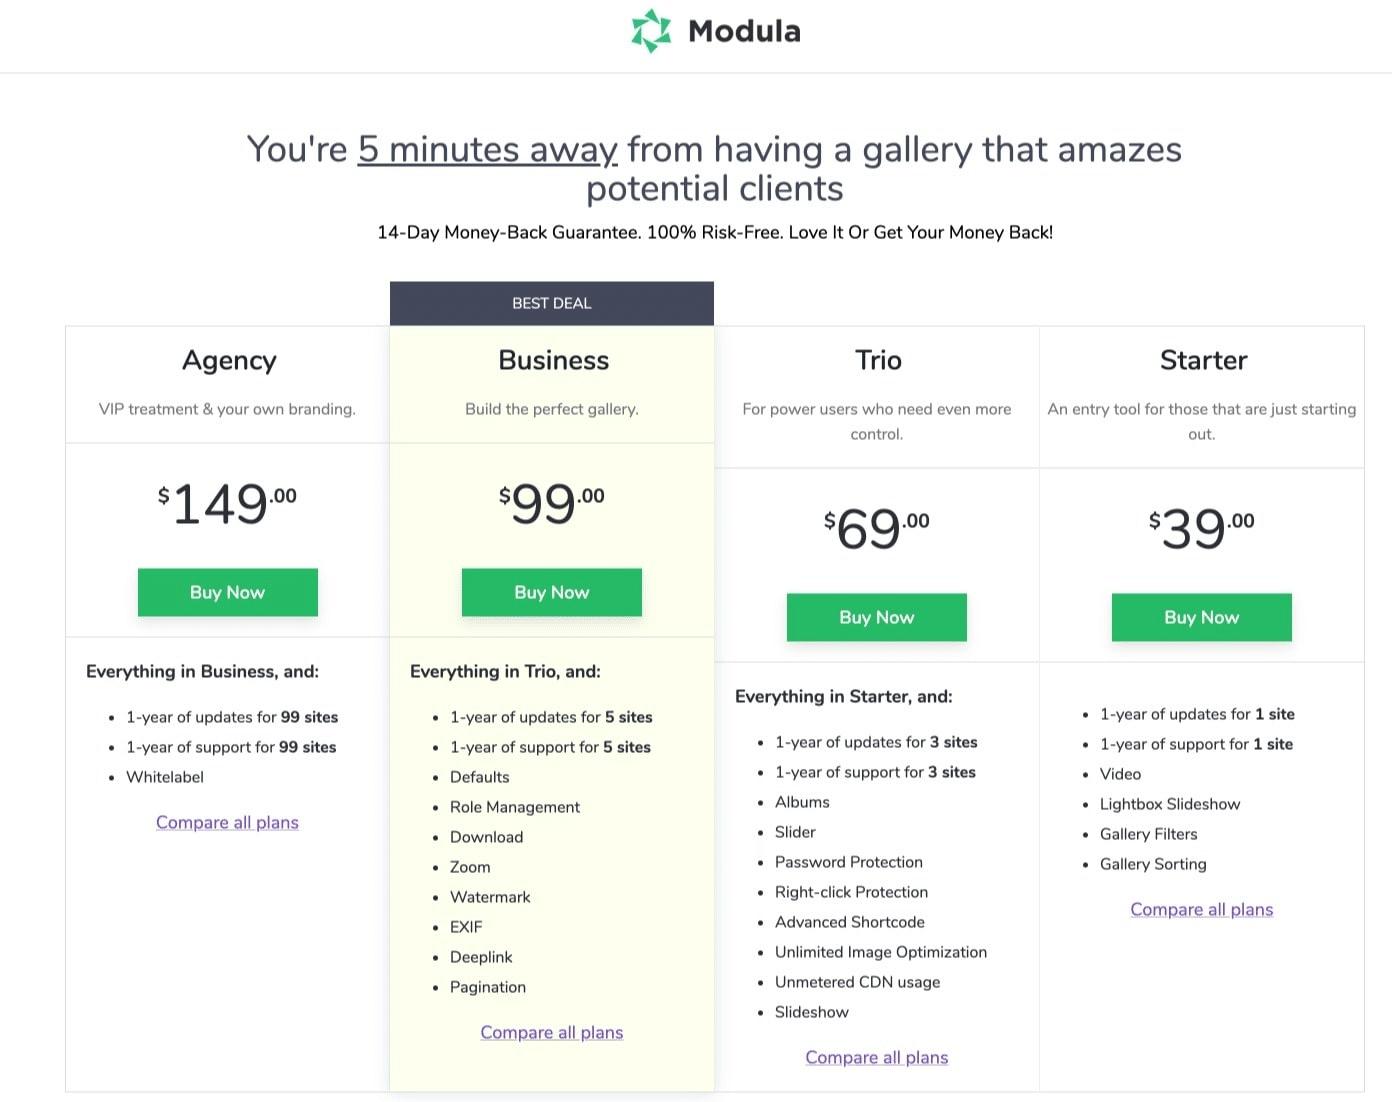 Modula pricing